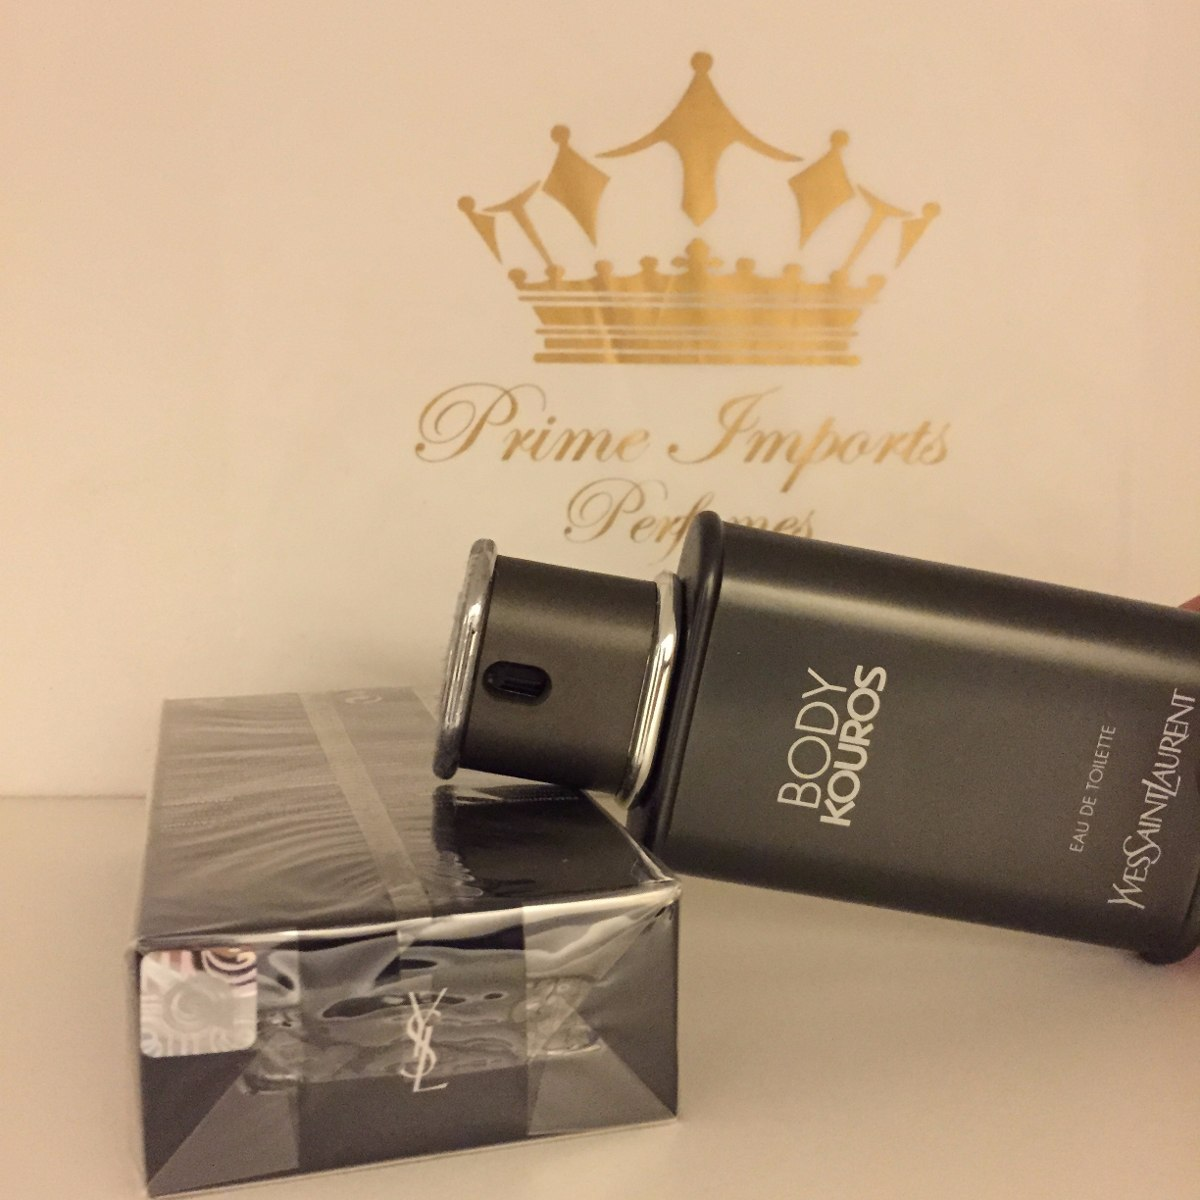 Perfume Kouros Bom Yahoo: Yves Saint Laurent- Masculino- Original